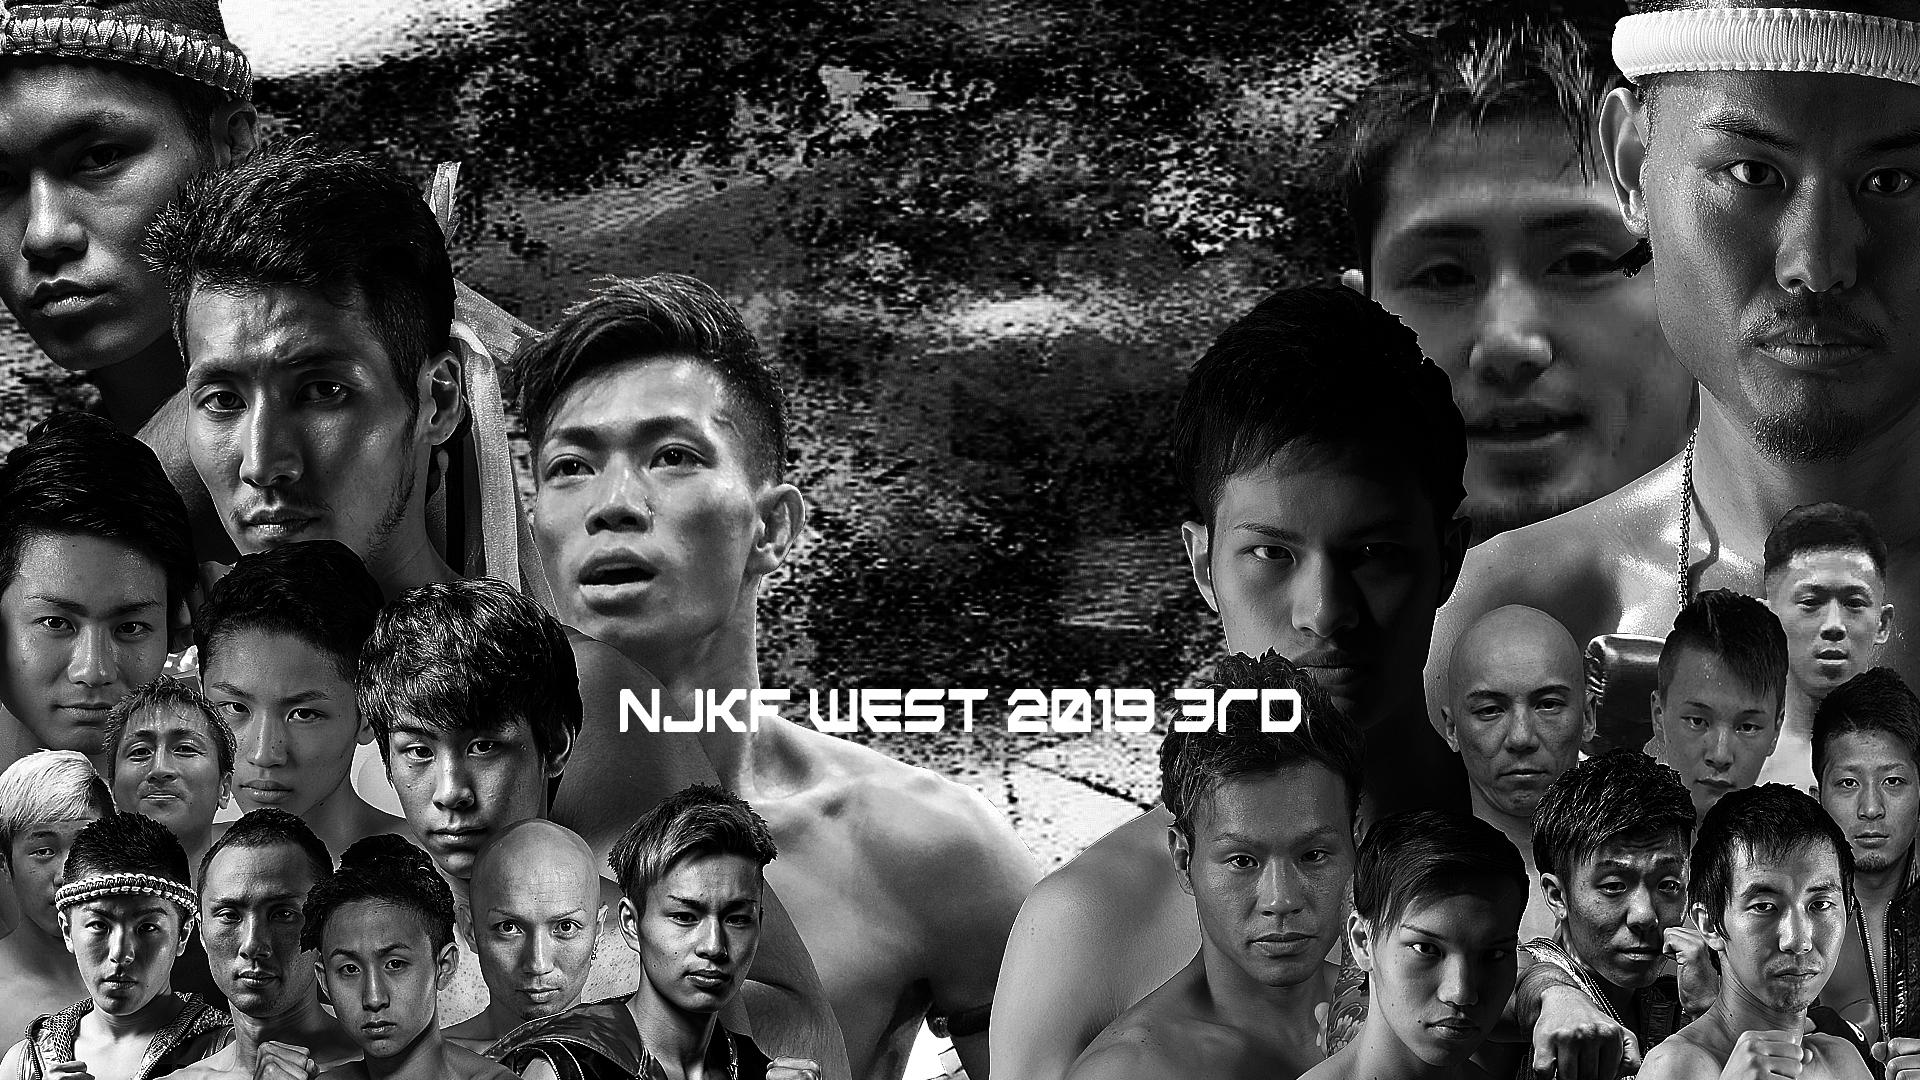 NJKF 2019 west 3rd